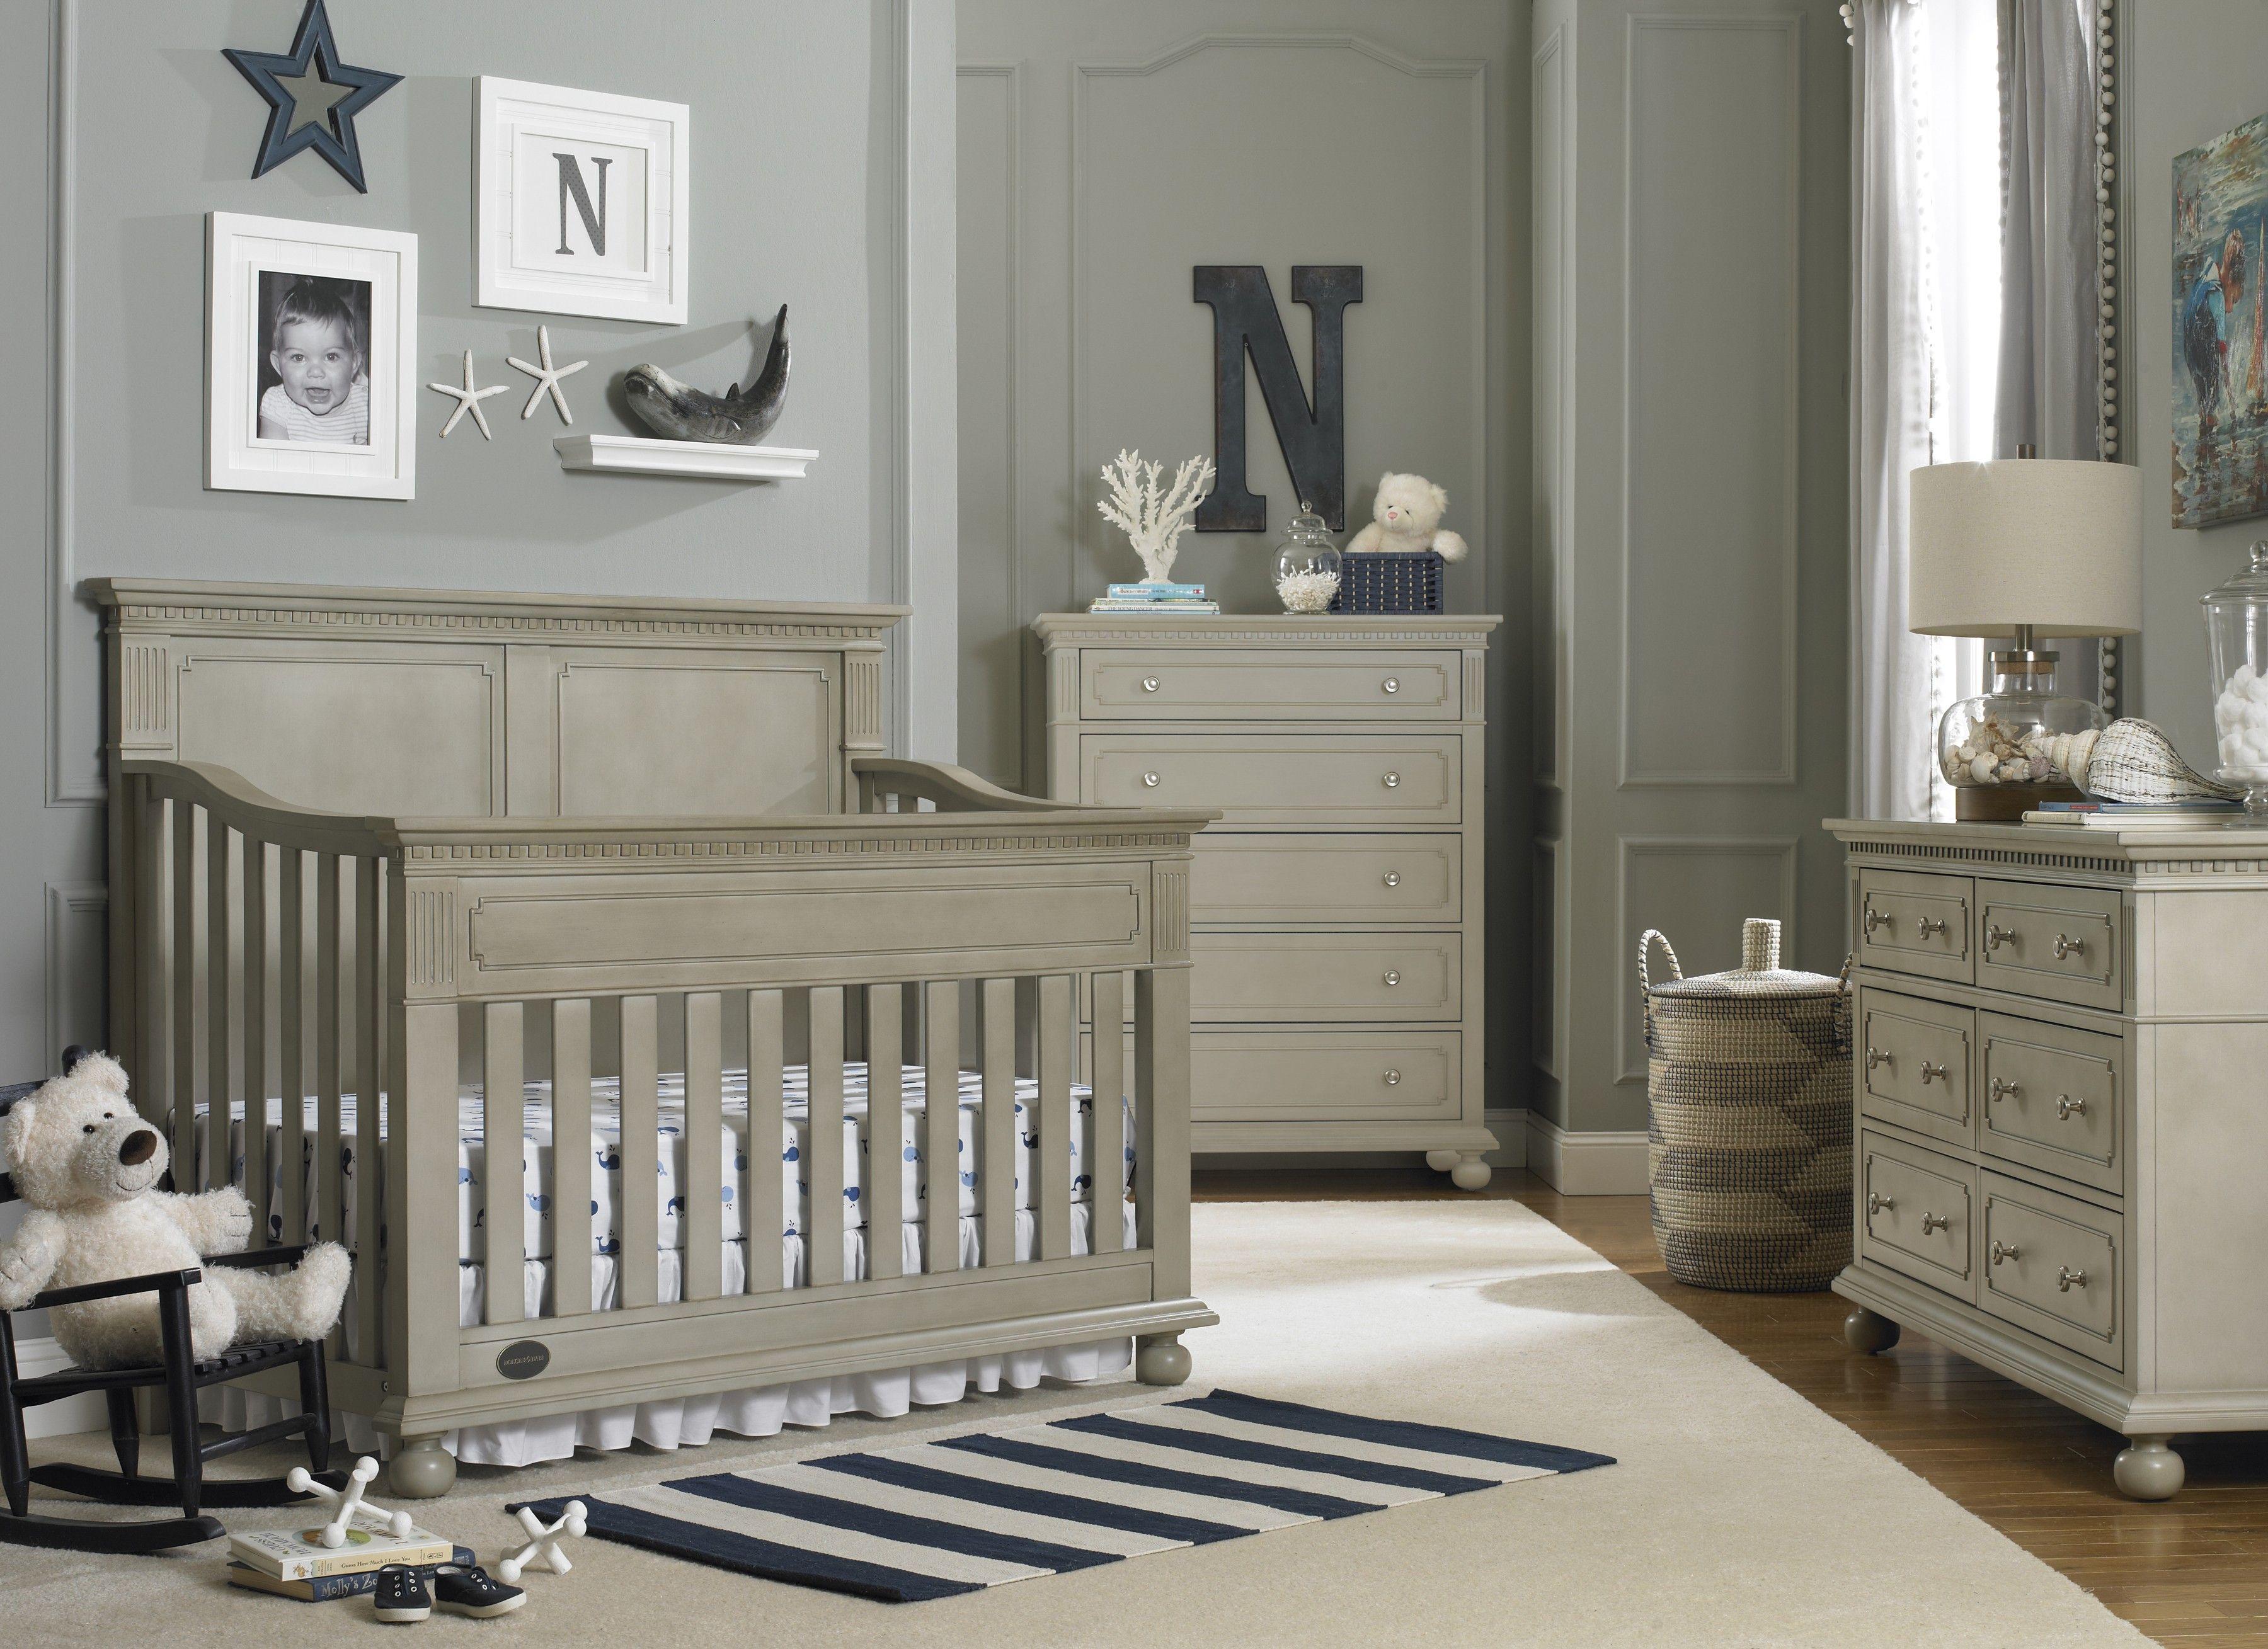 Boy Nursery Ideas Part - 20: Amazing Vintage Baby Boy Nursery Ideas And Remodelling Gallery Design Ideas